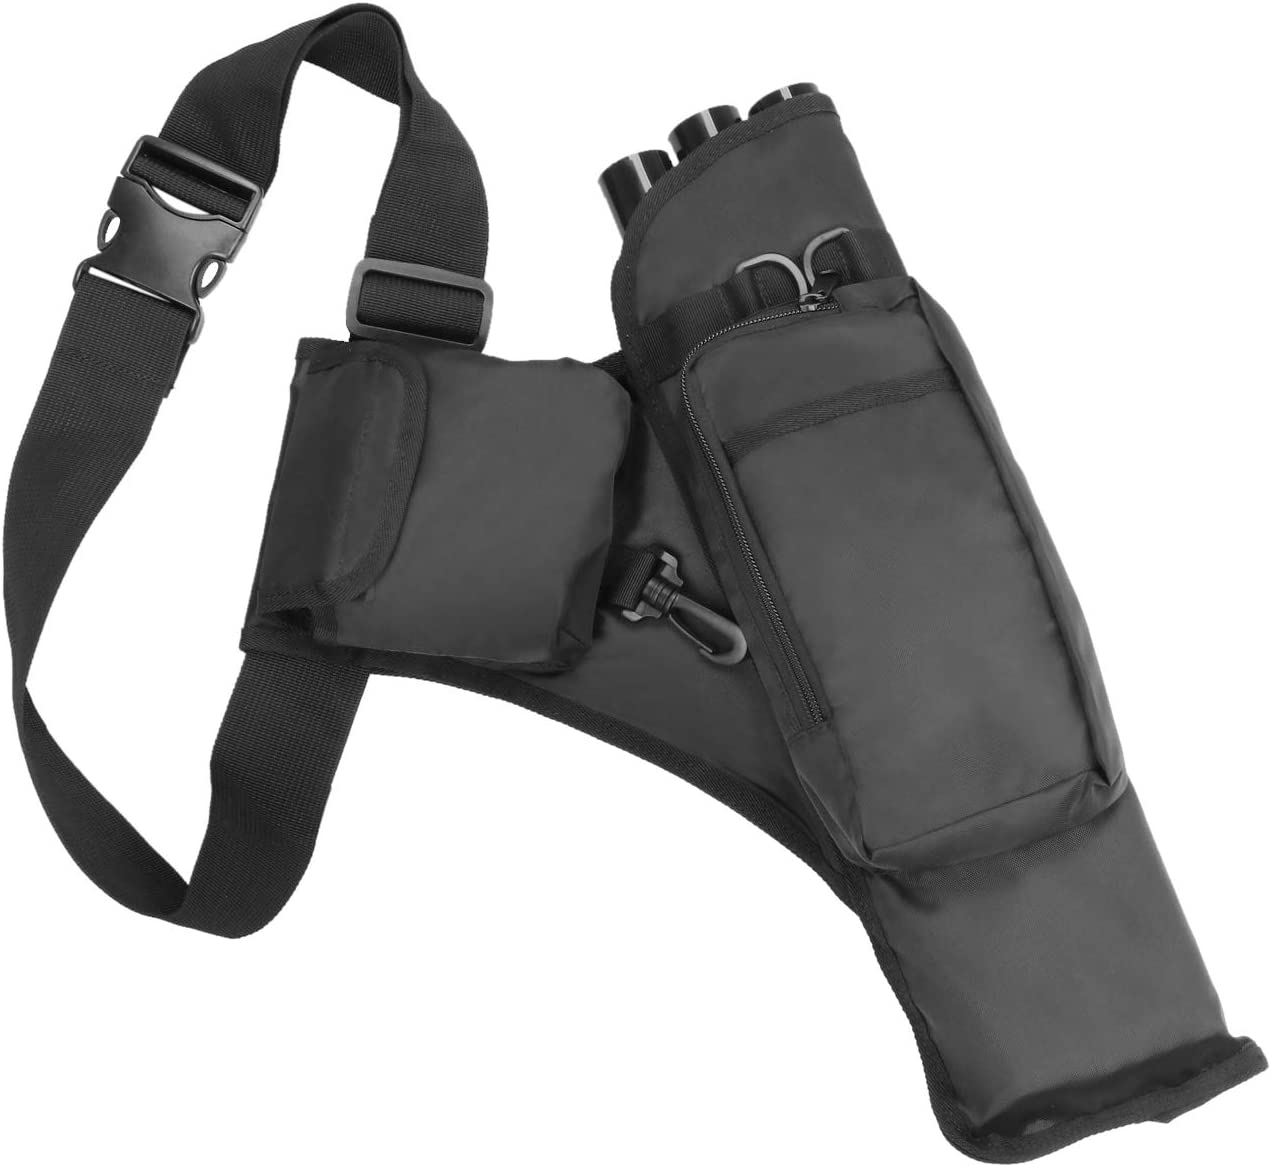 KEESIN Bolsa de Flecha de Caza al Aire Libre 3 Tubos Bow Archery Titular de Carcaj con Bolsillos y Correa de Hombro Ajustable